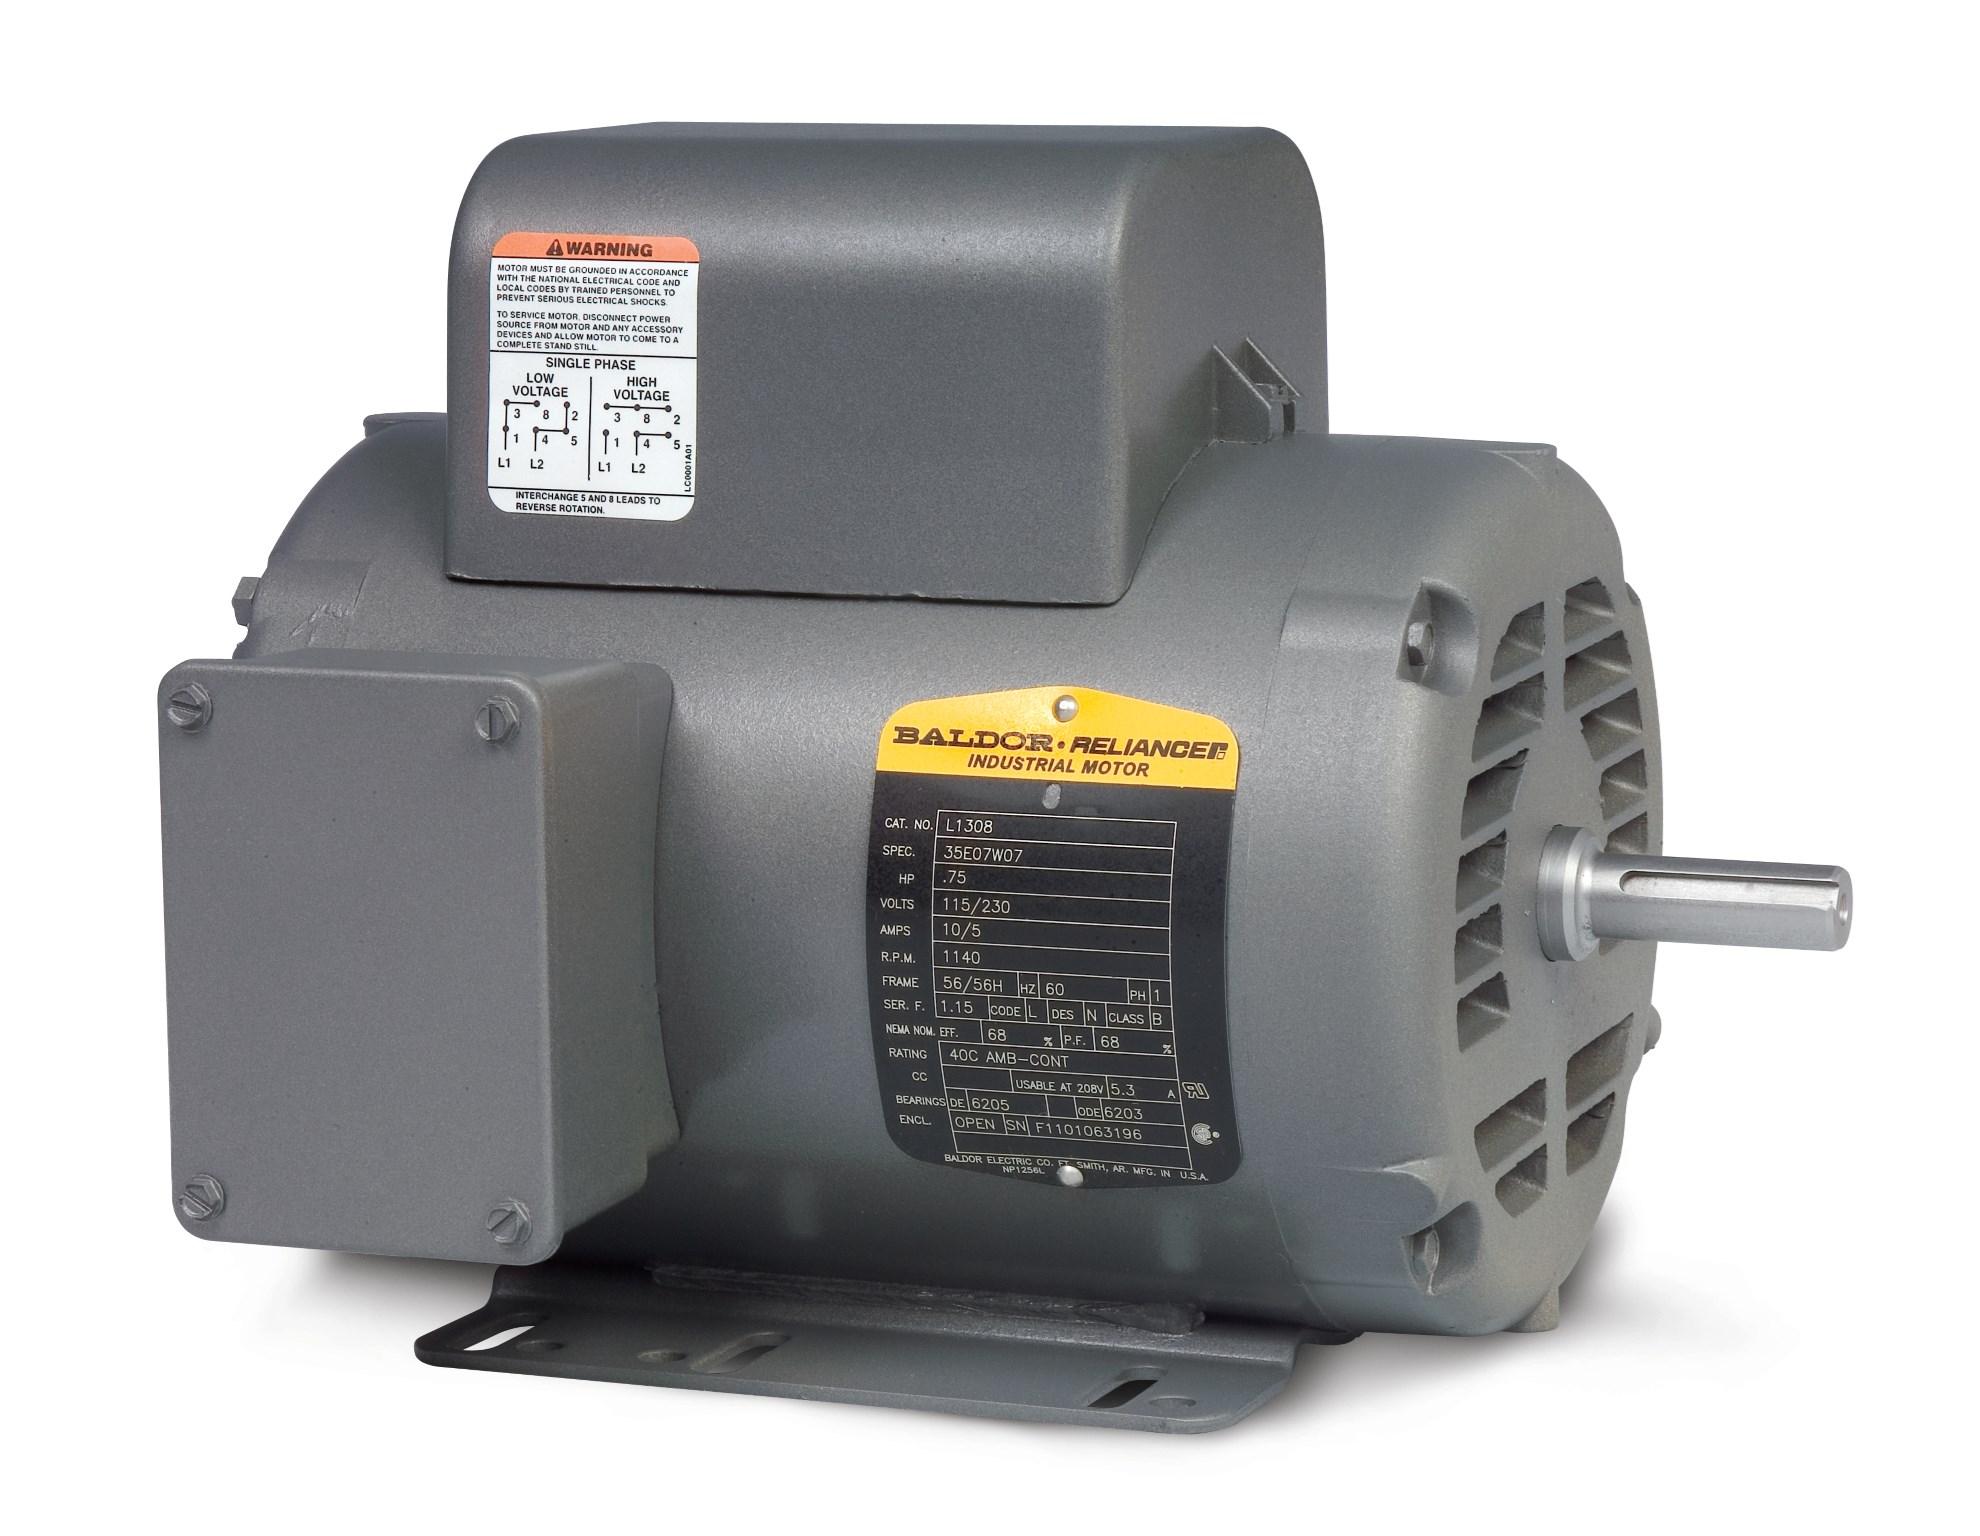 250?bcdwhite6asd16hd2566wd256 baldor 10 hp electric motor wiring diagram efcaviation com baldor l1430t wiring diagram at mifinder.co